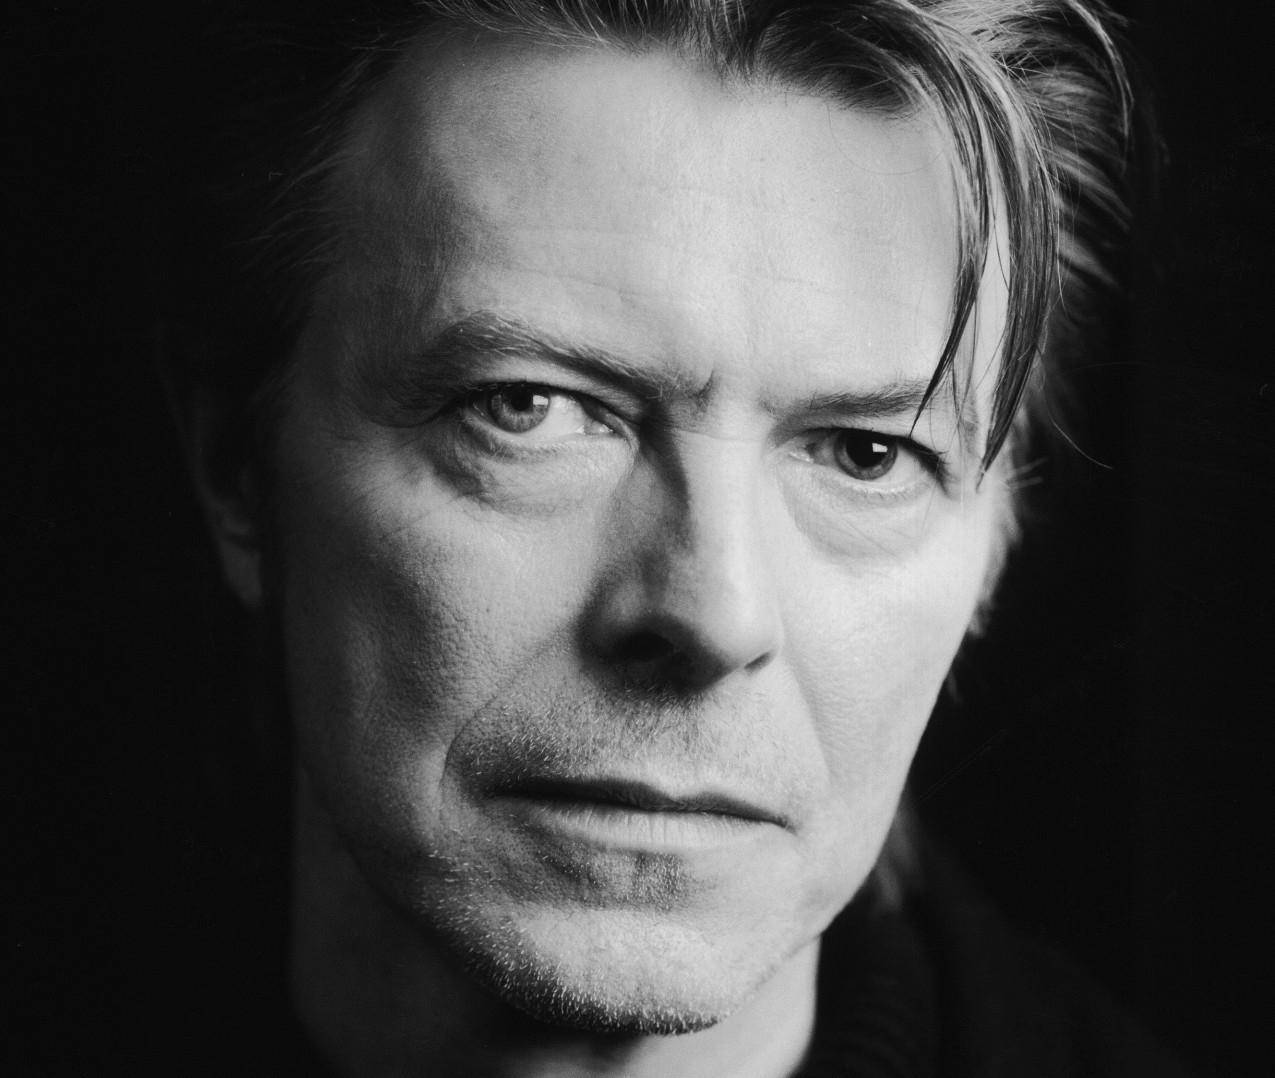 Preminuo David Bowie